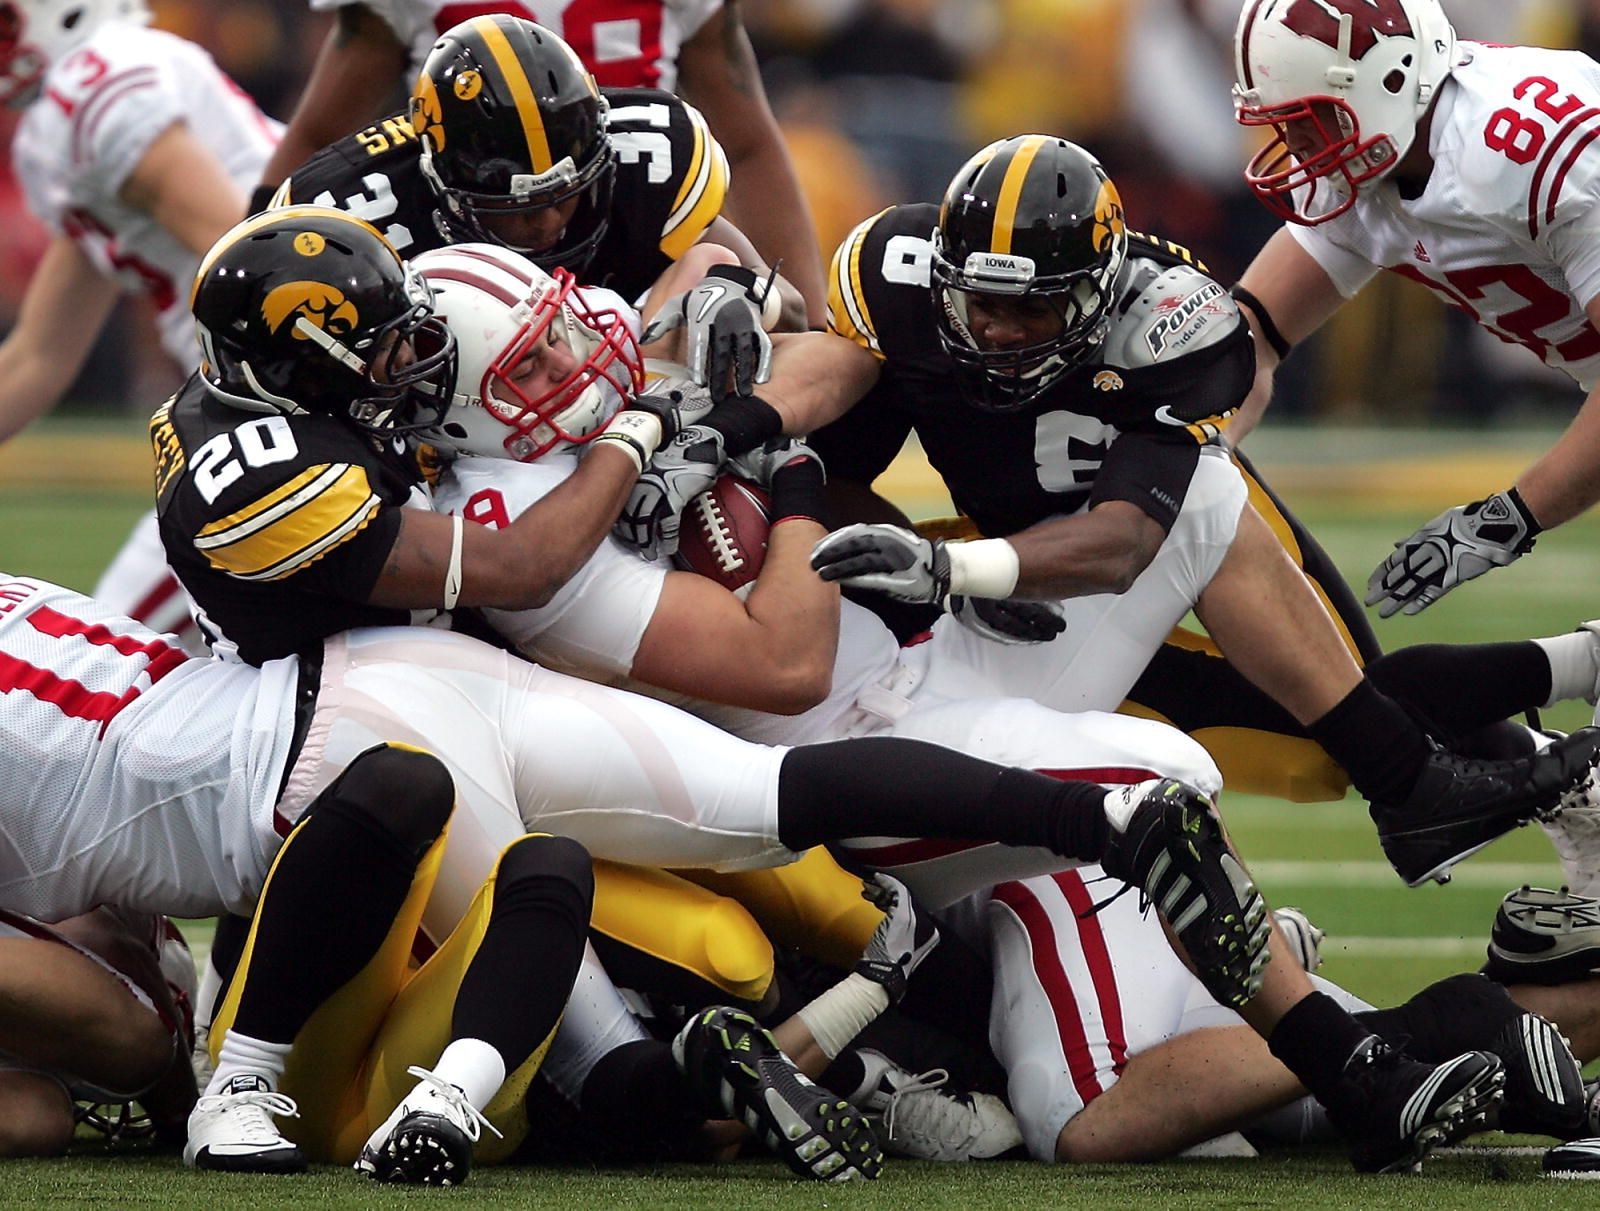 See a Wisconsin vs. Iowa Hawkeyes football game, | Iowa ...